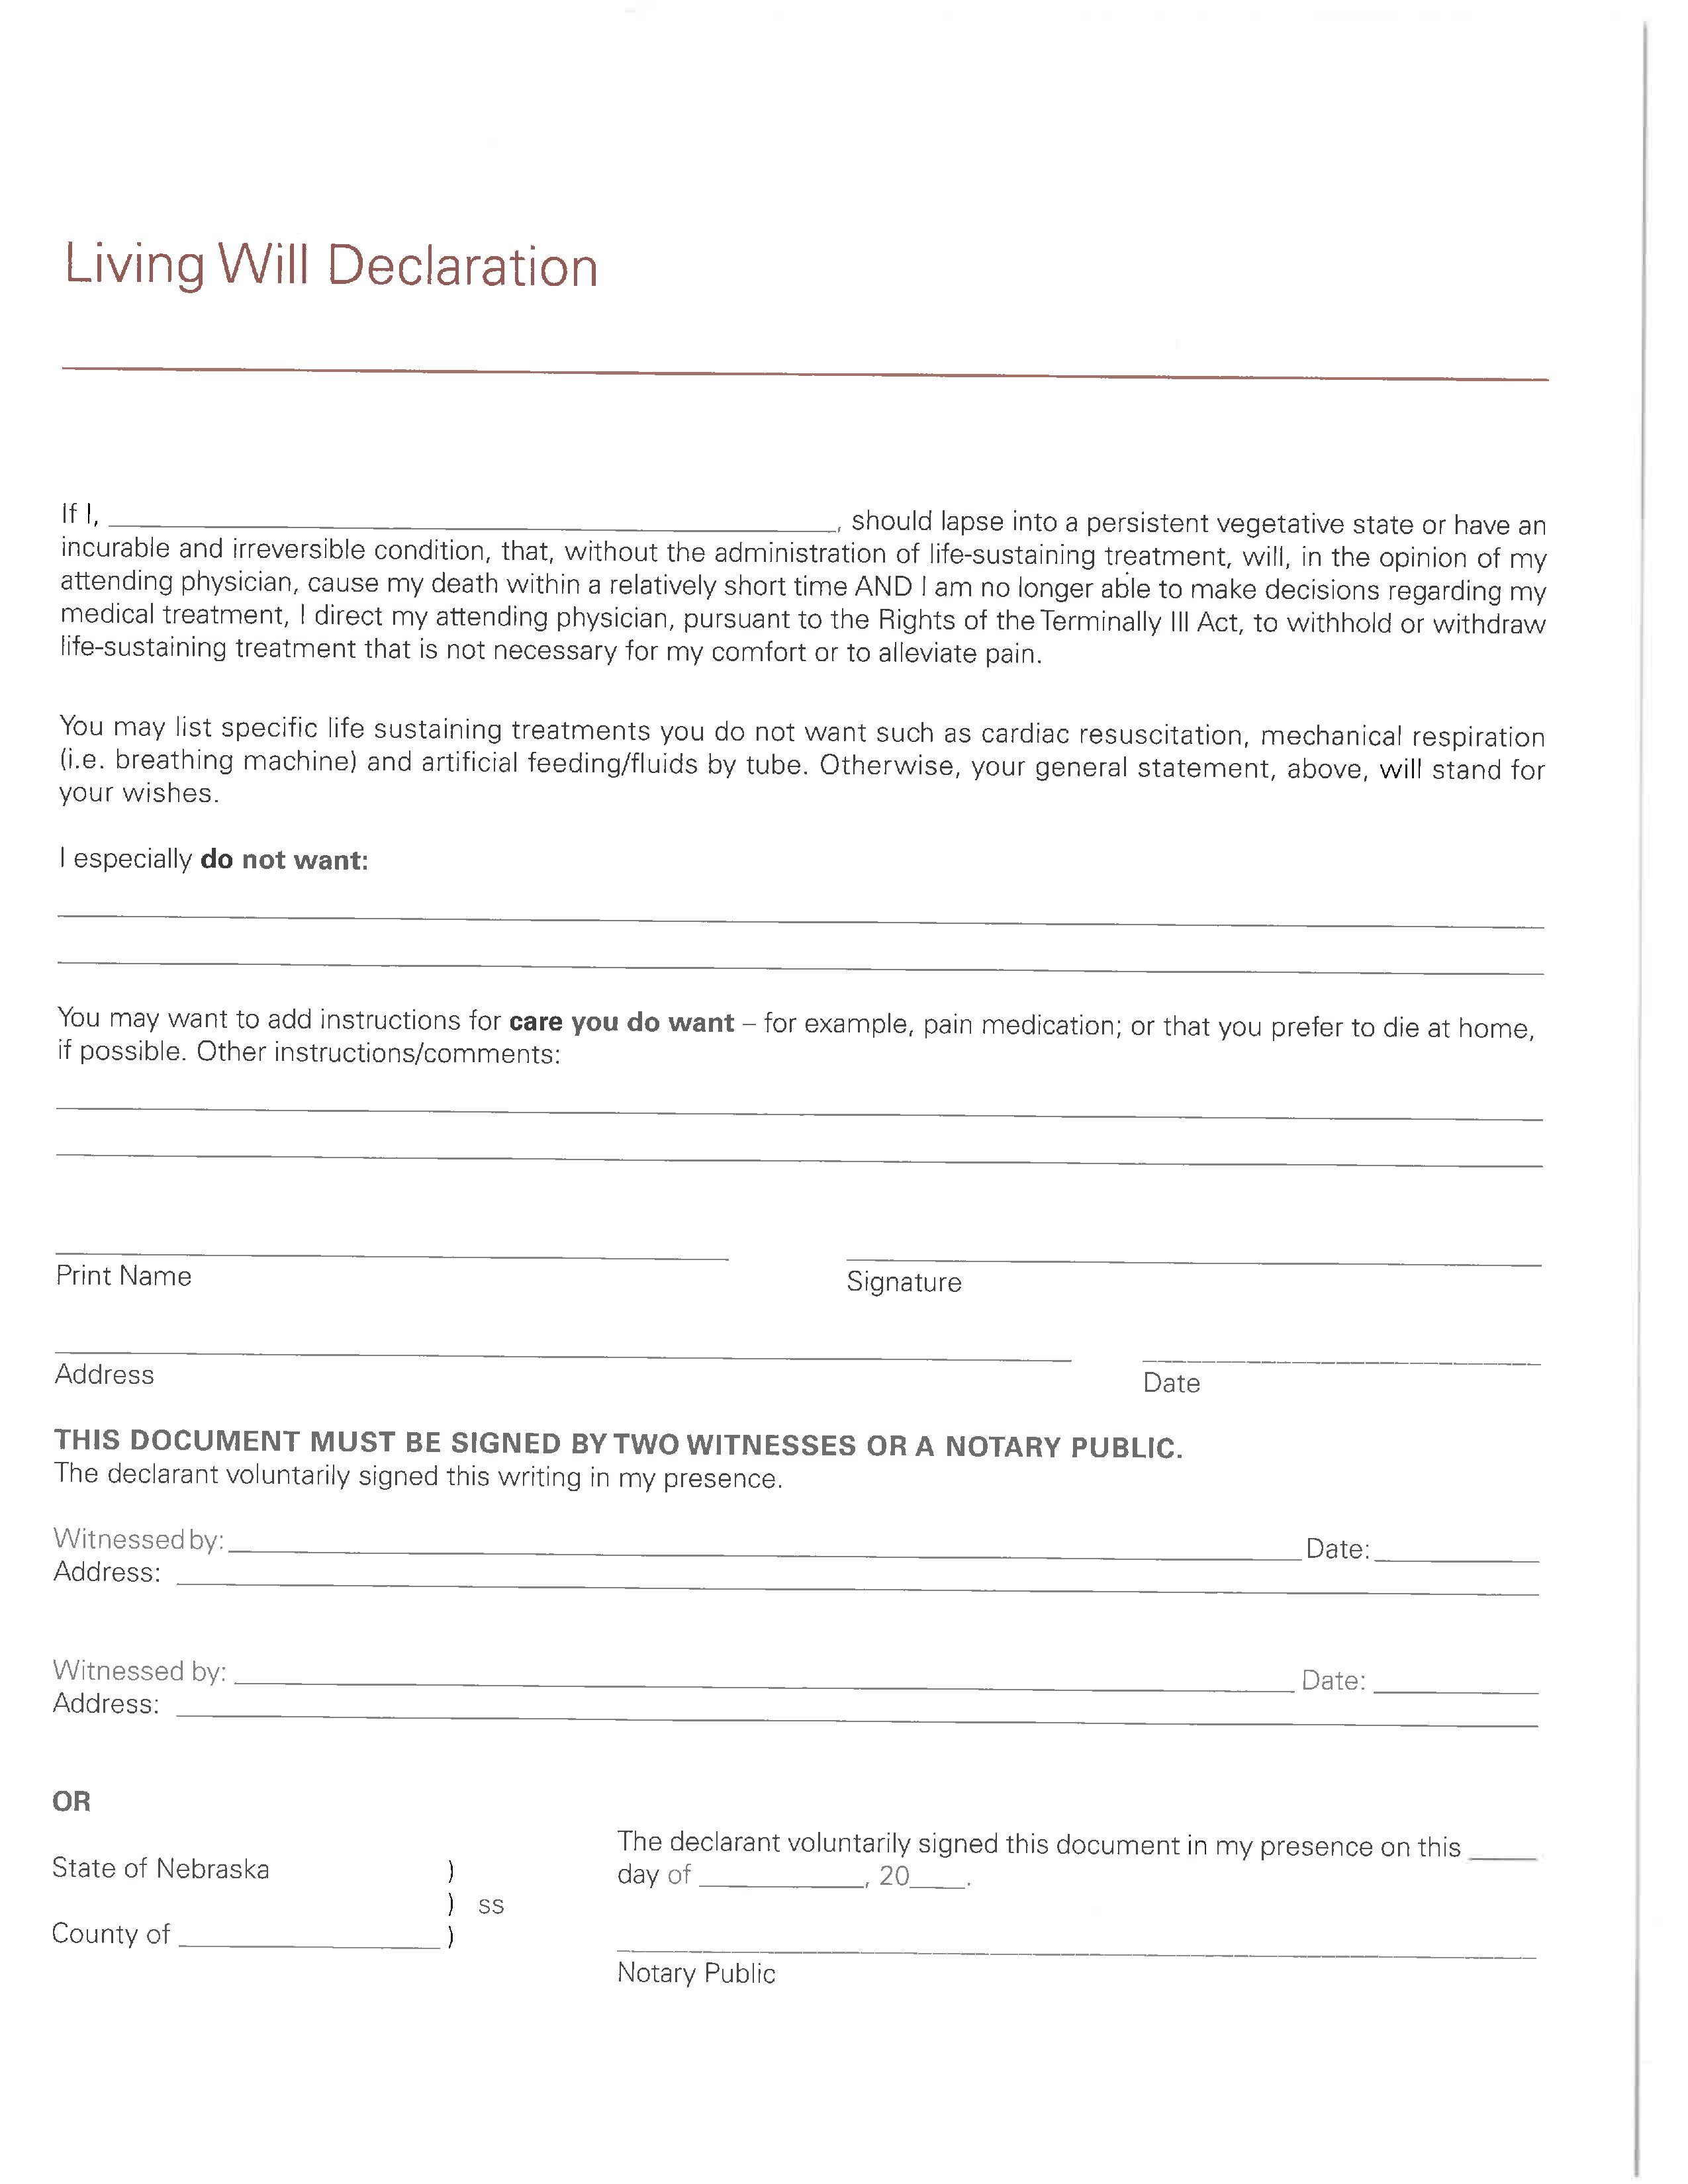 Nebraska Living Will Form Fillable PDF Free Printable